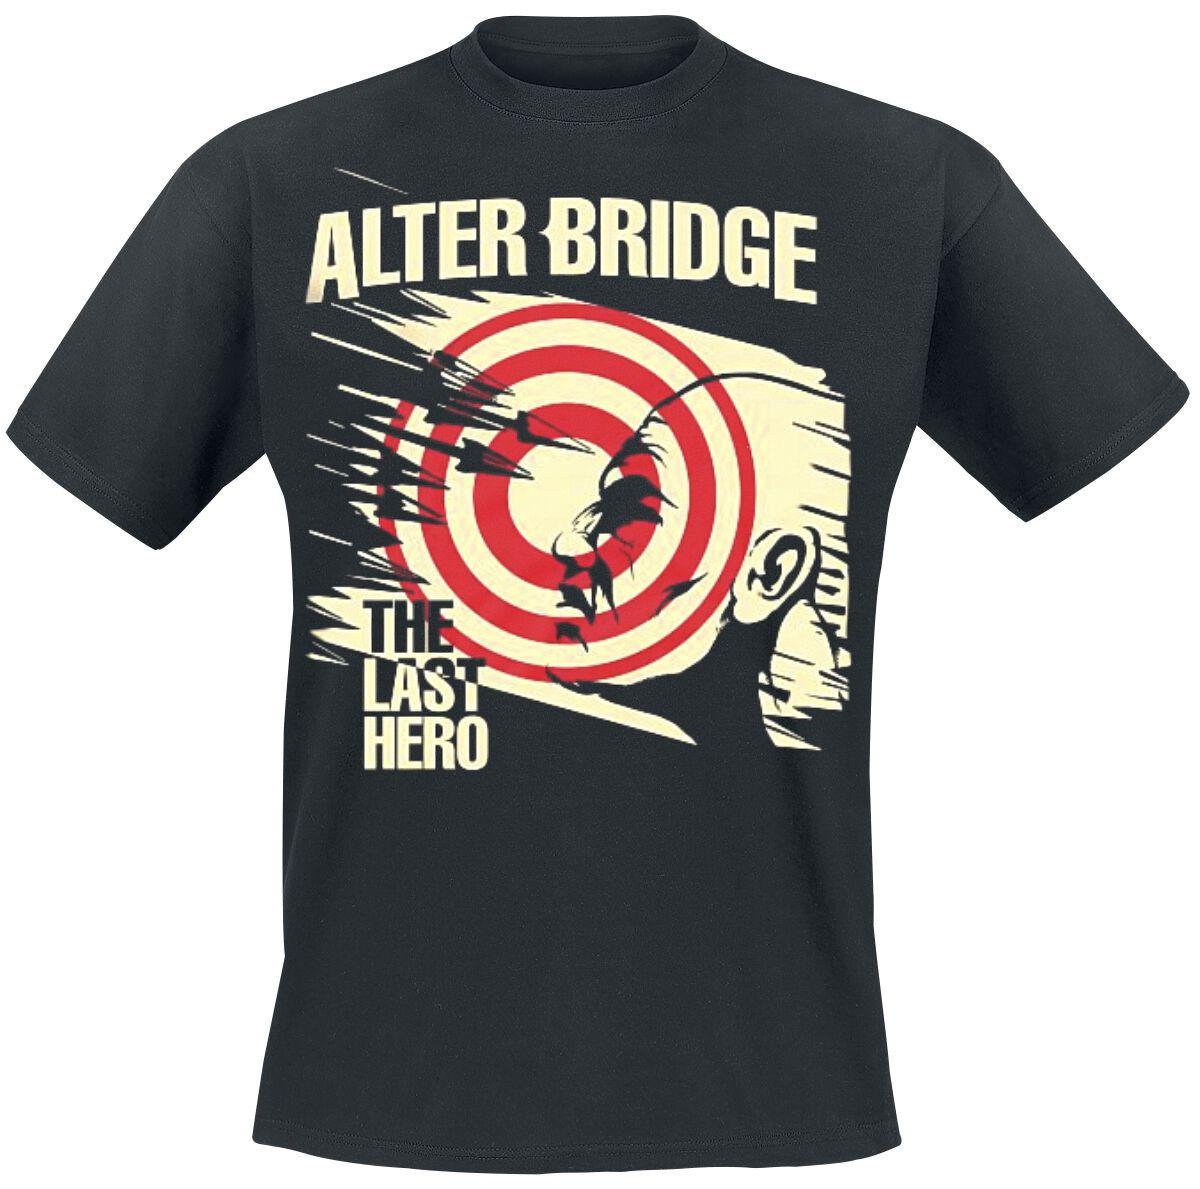 Zespoły - Koszulki - T-Shirt Alter Bridge The Last Hero T-Shirt czarny - 357052